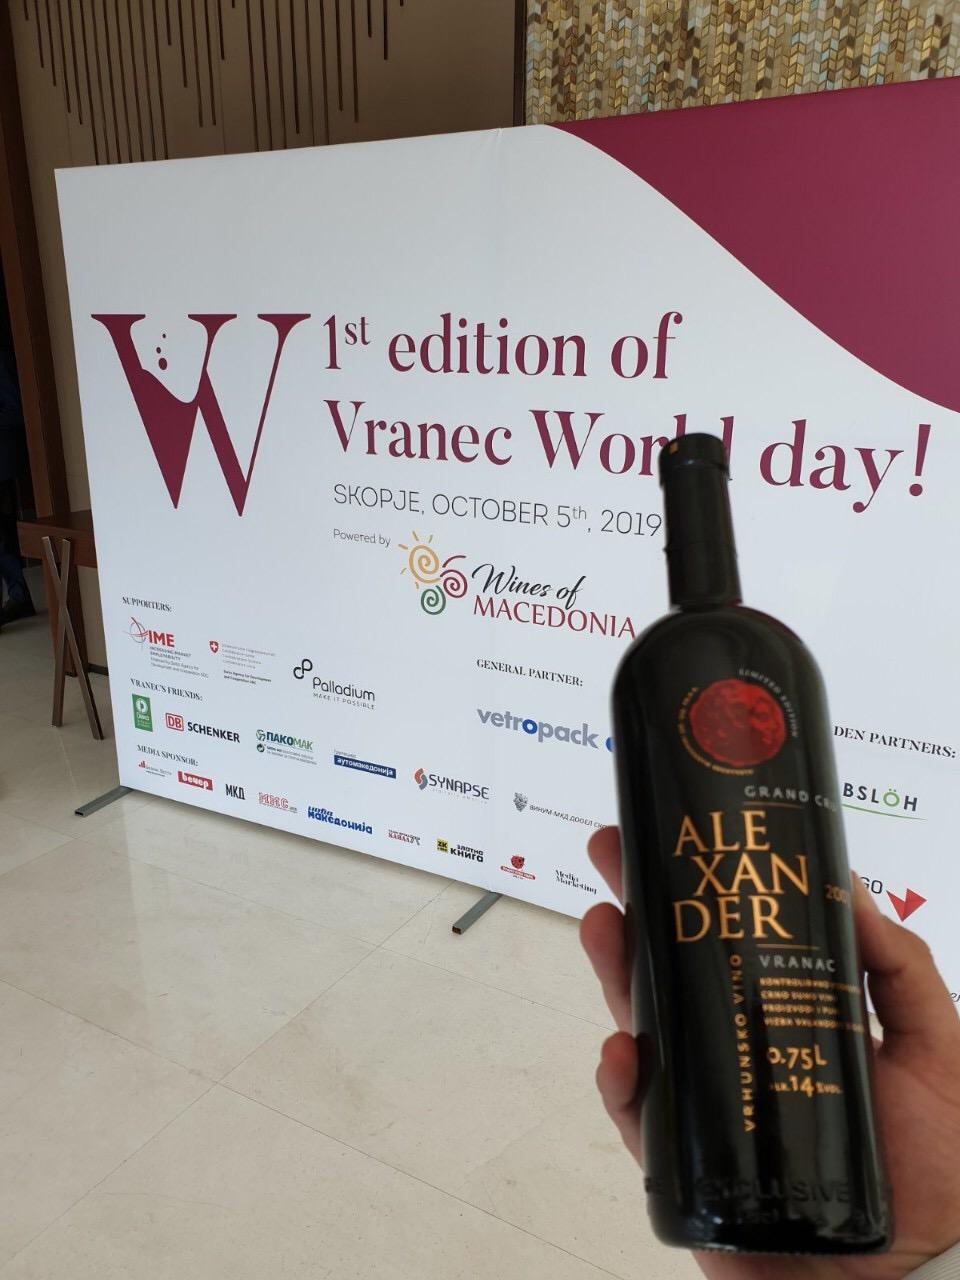 Vranac World Day 1st edition